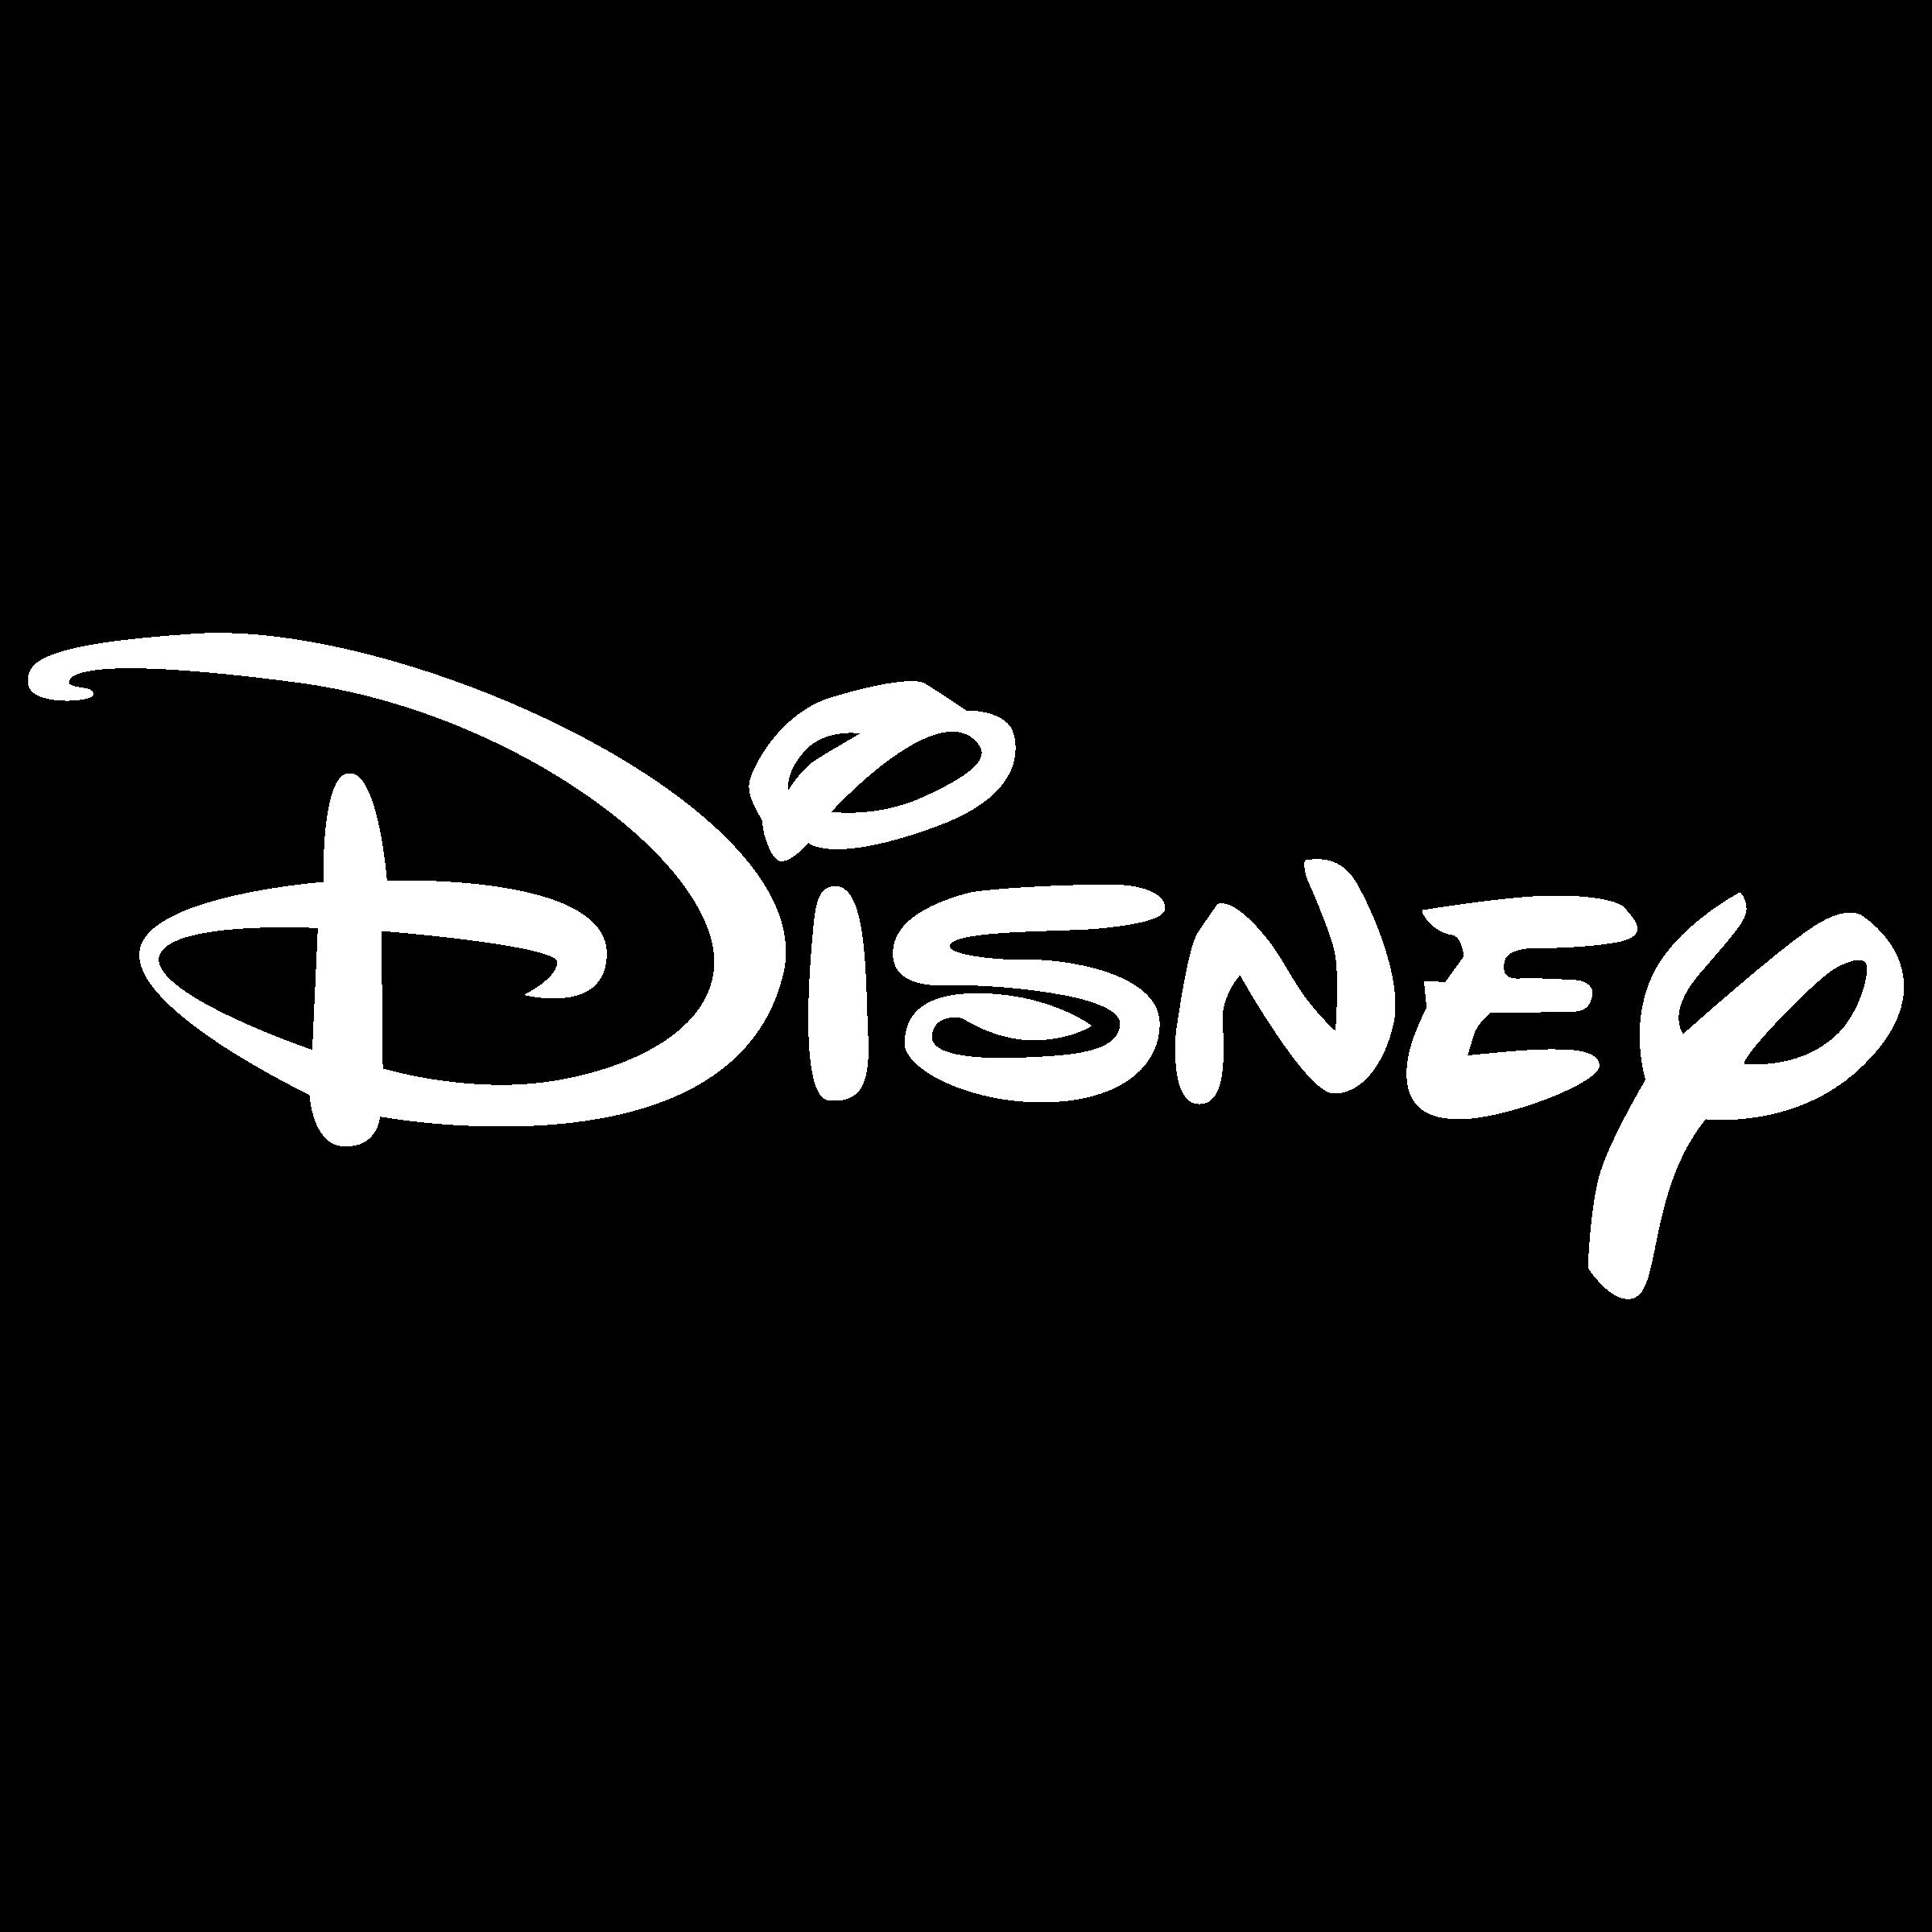 Disney Logo PNG Transparent & SVG Vector - Freebie Supply